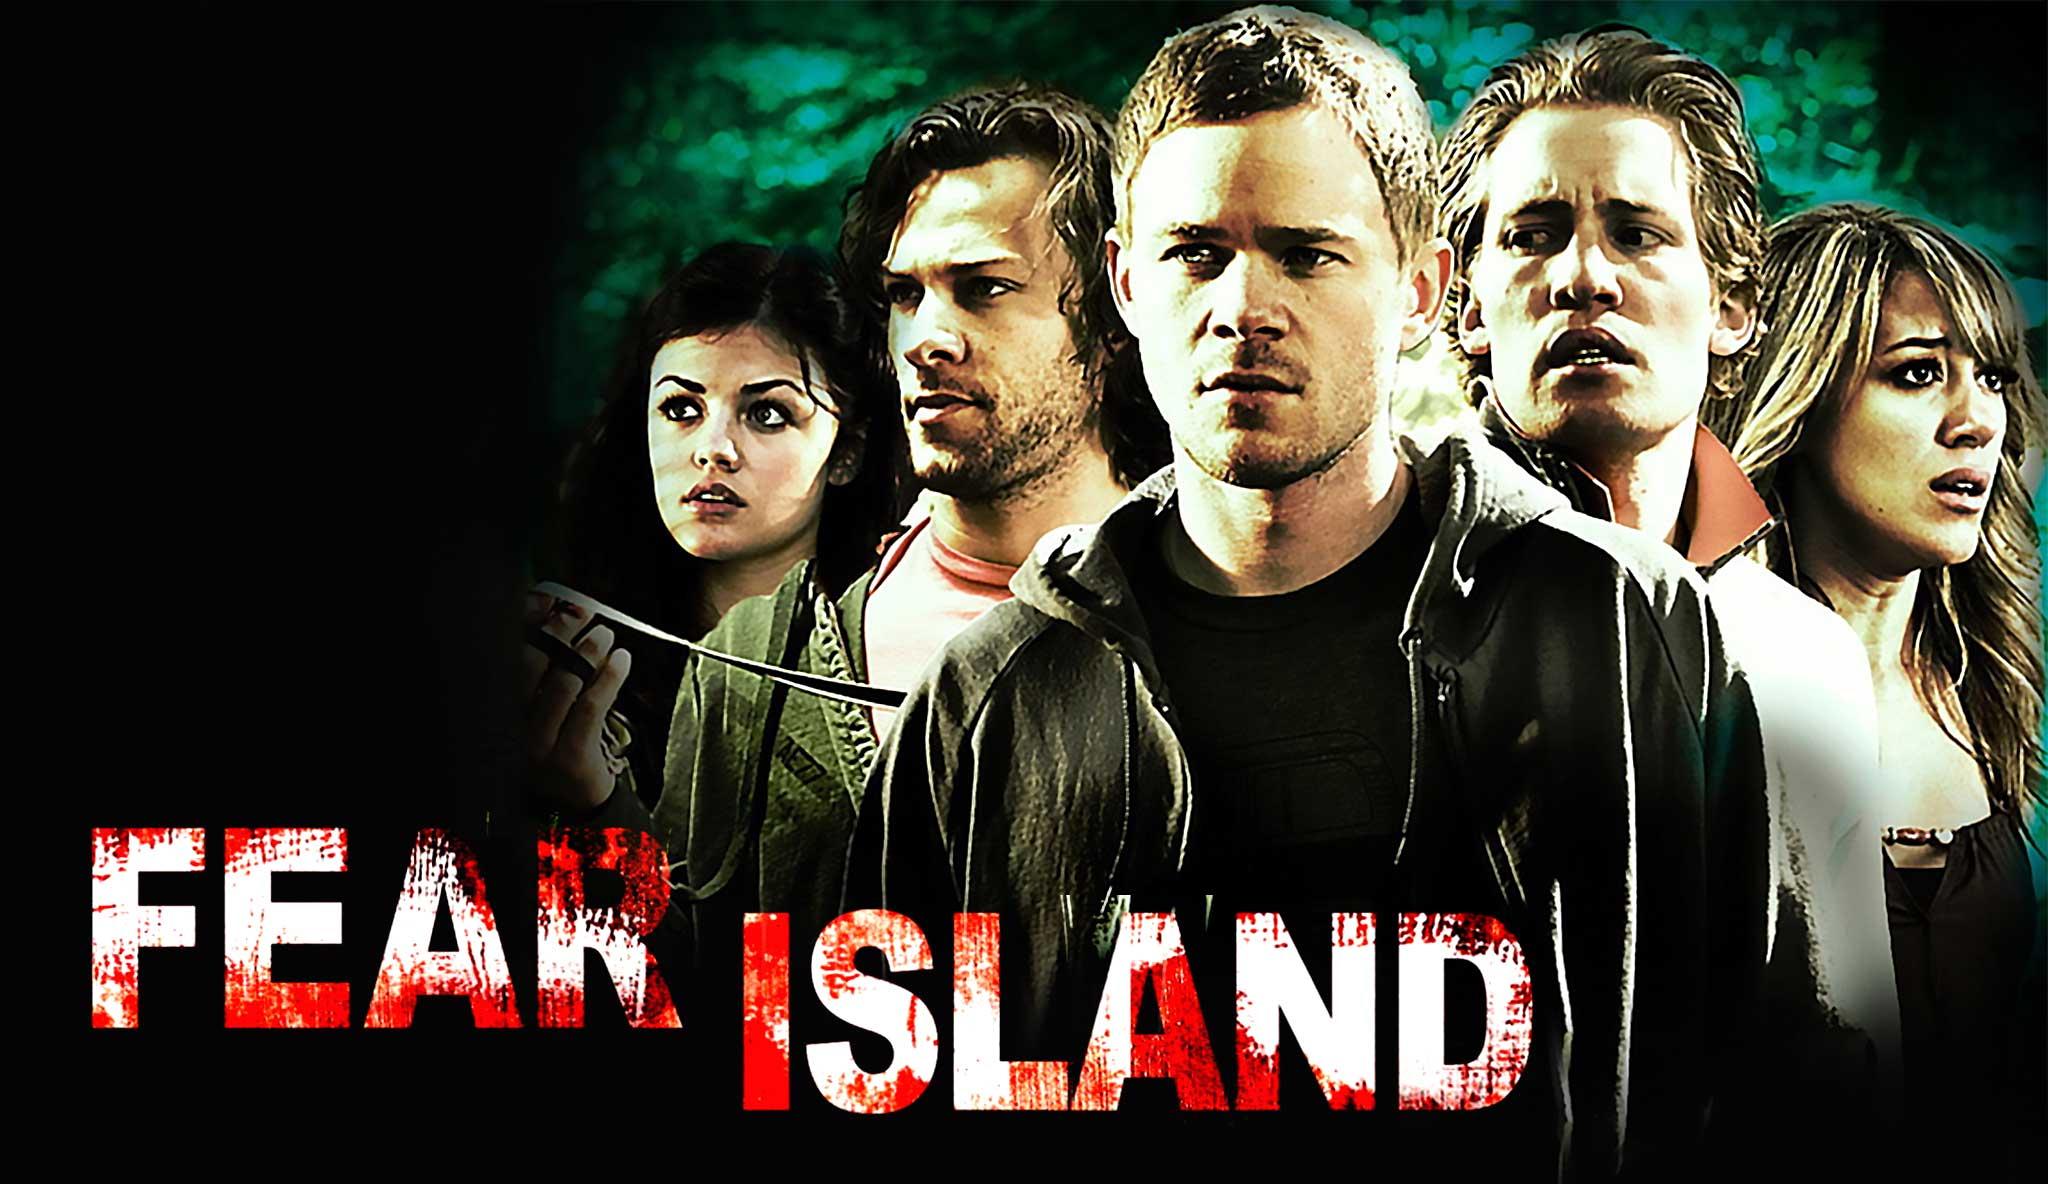 fear-island\header.jpg